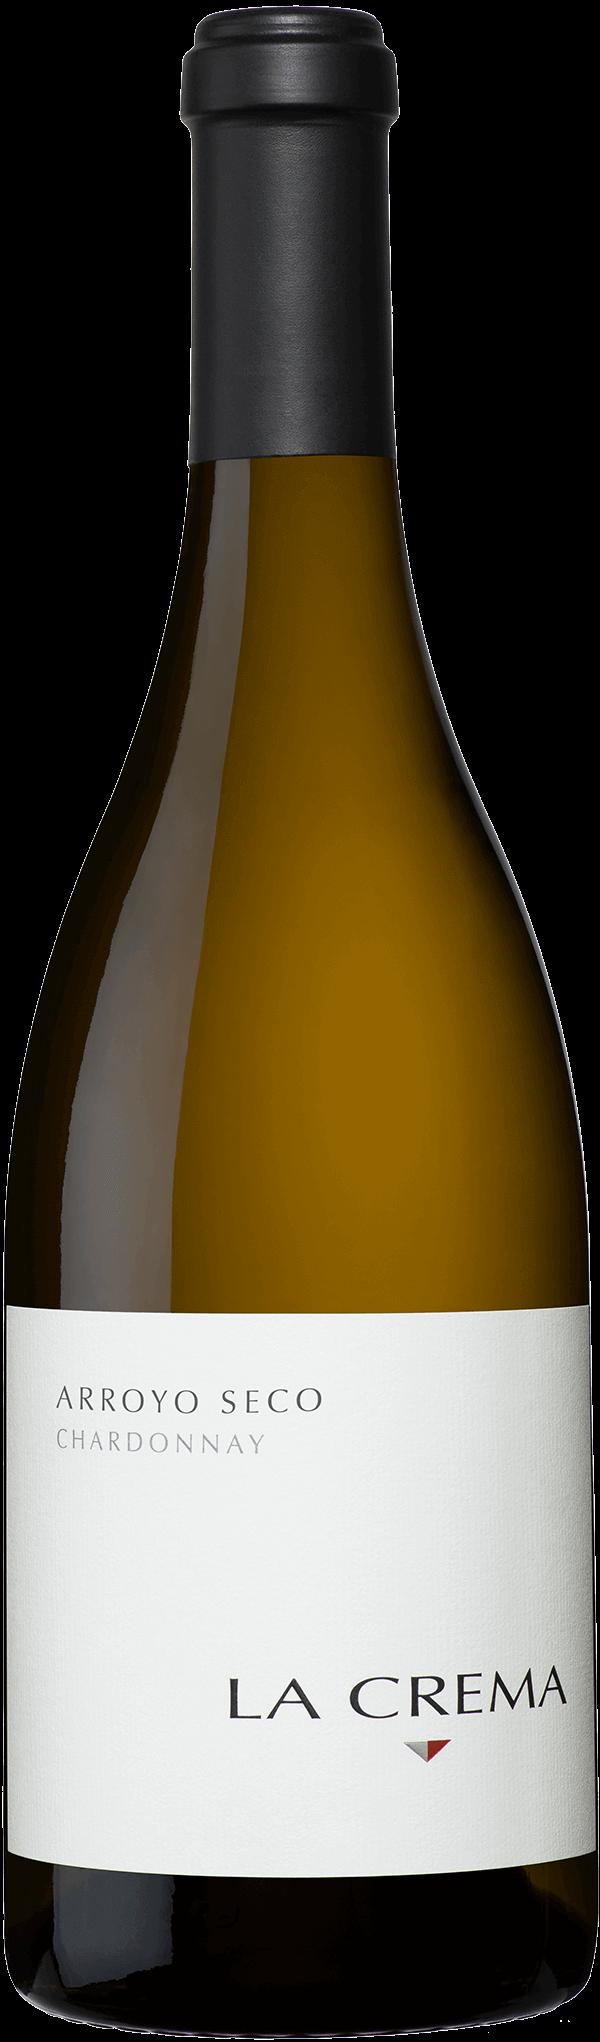 2019 Arroyo Seco Chardonnay